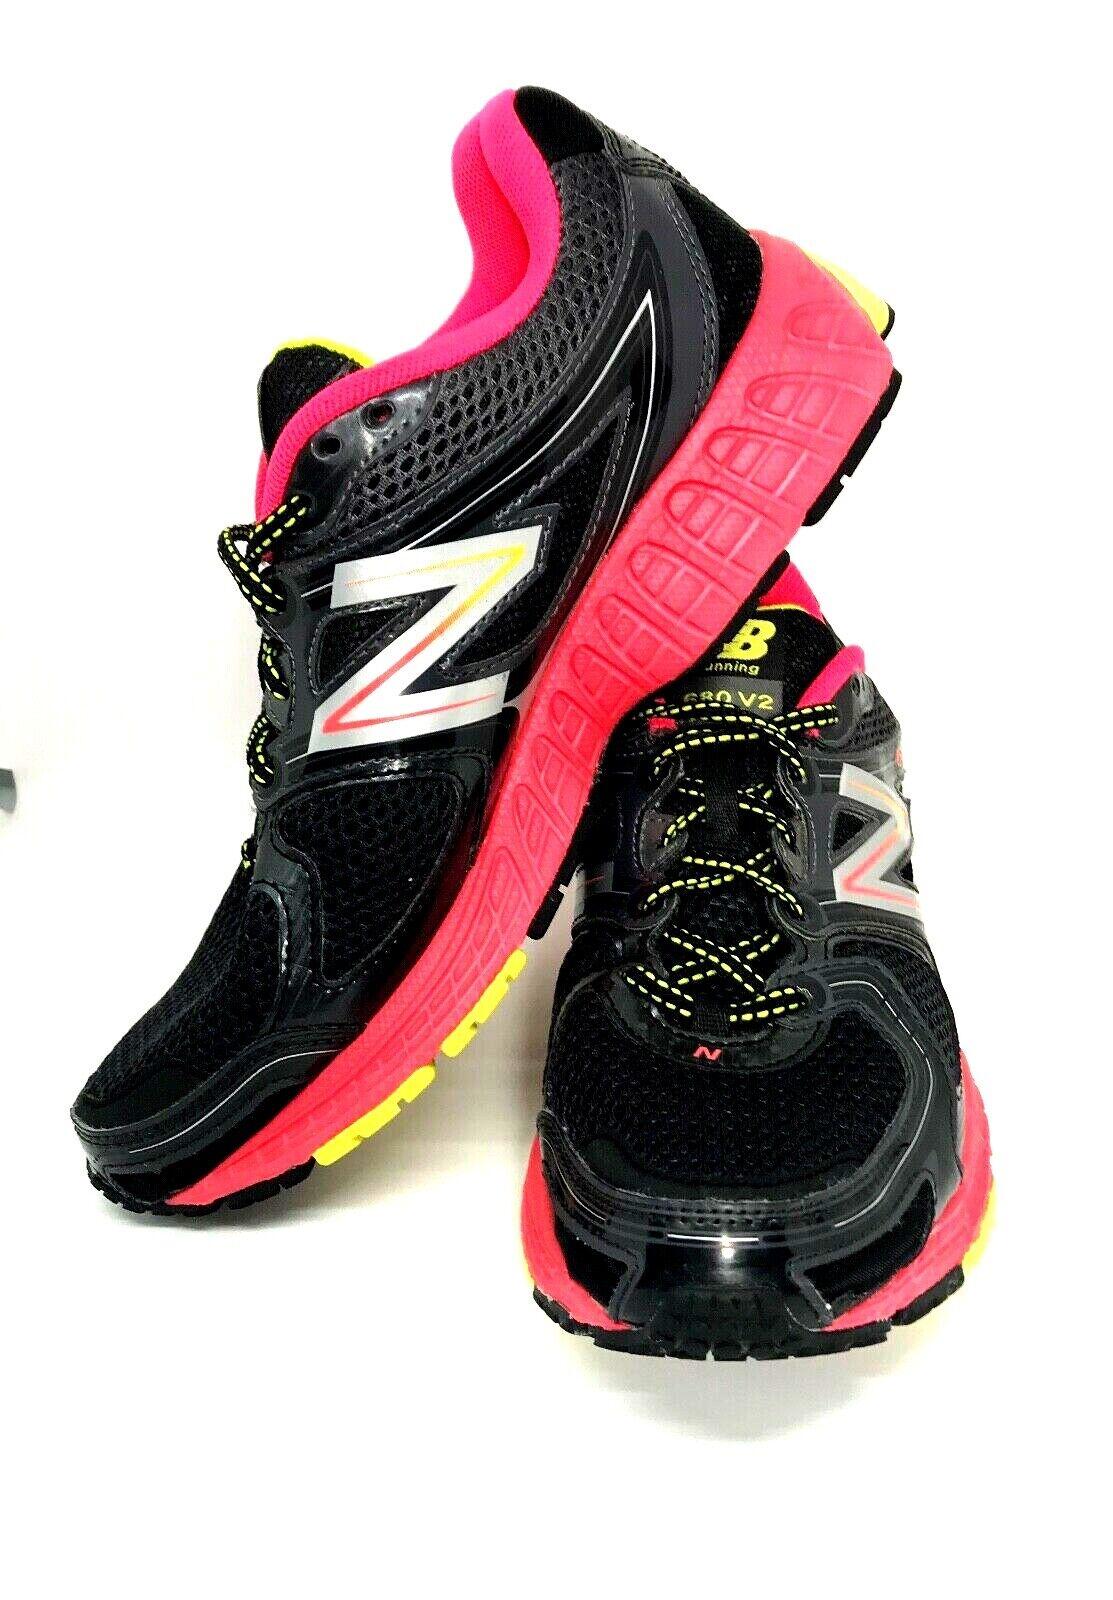 New Balance Women's 680 V2 Athletic Running Sneaker shoes Size 8.5  B